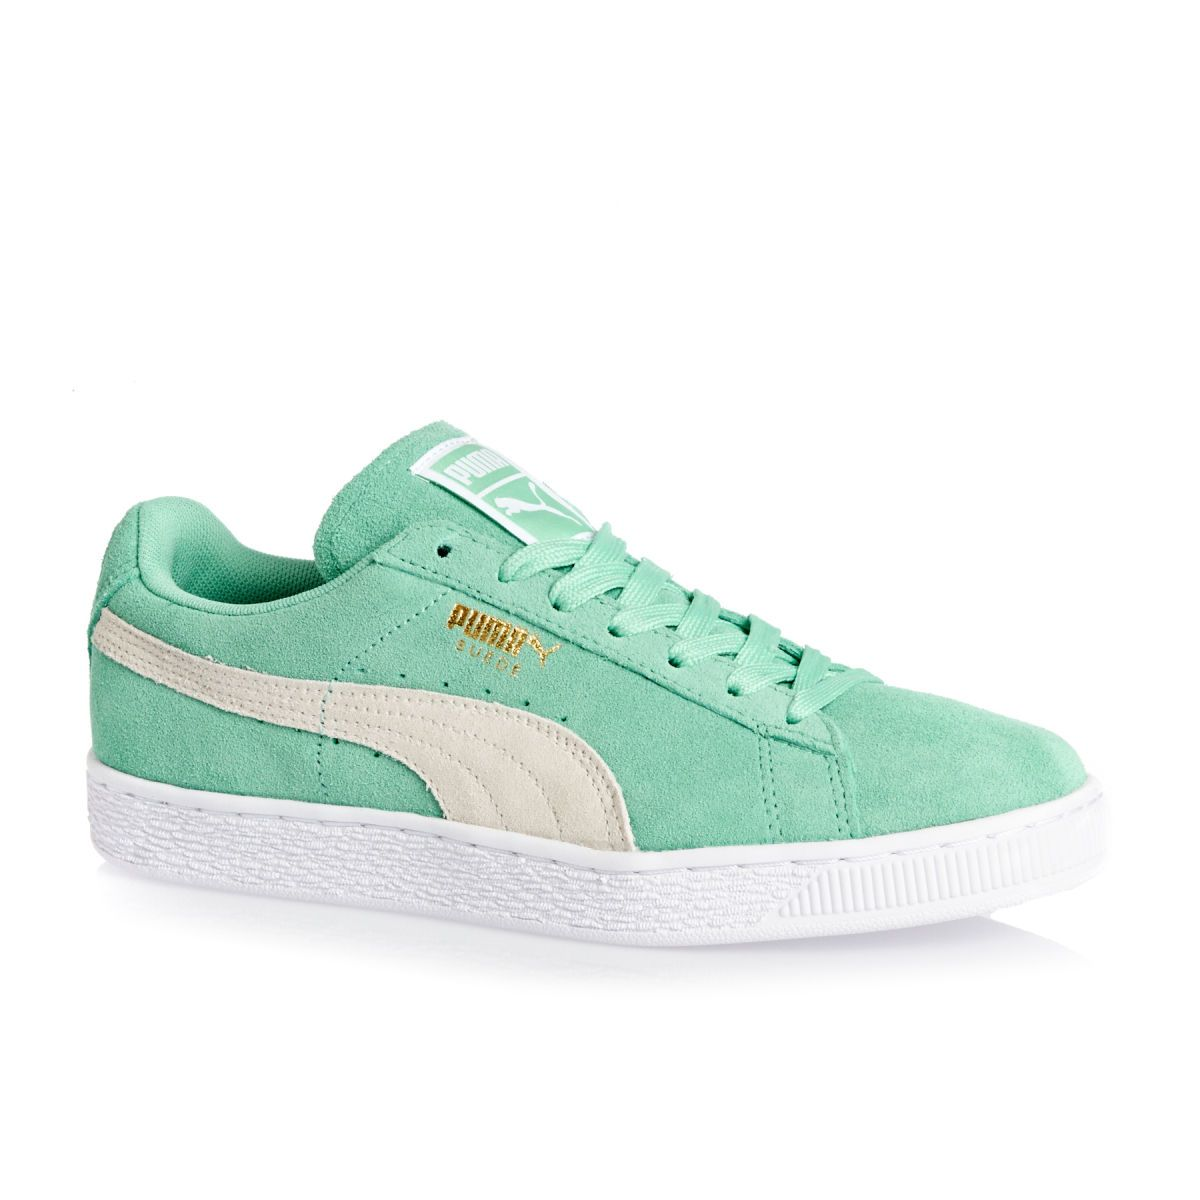 Puma Teal Shoes